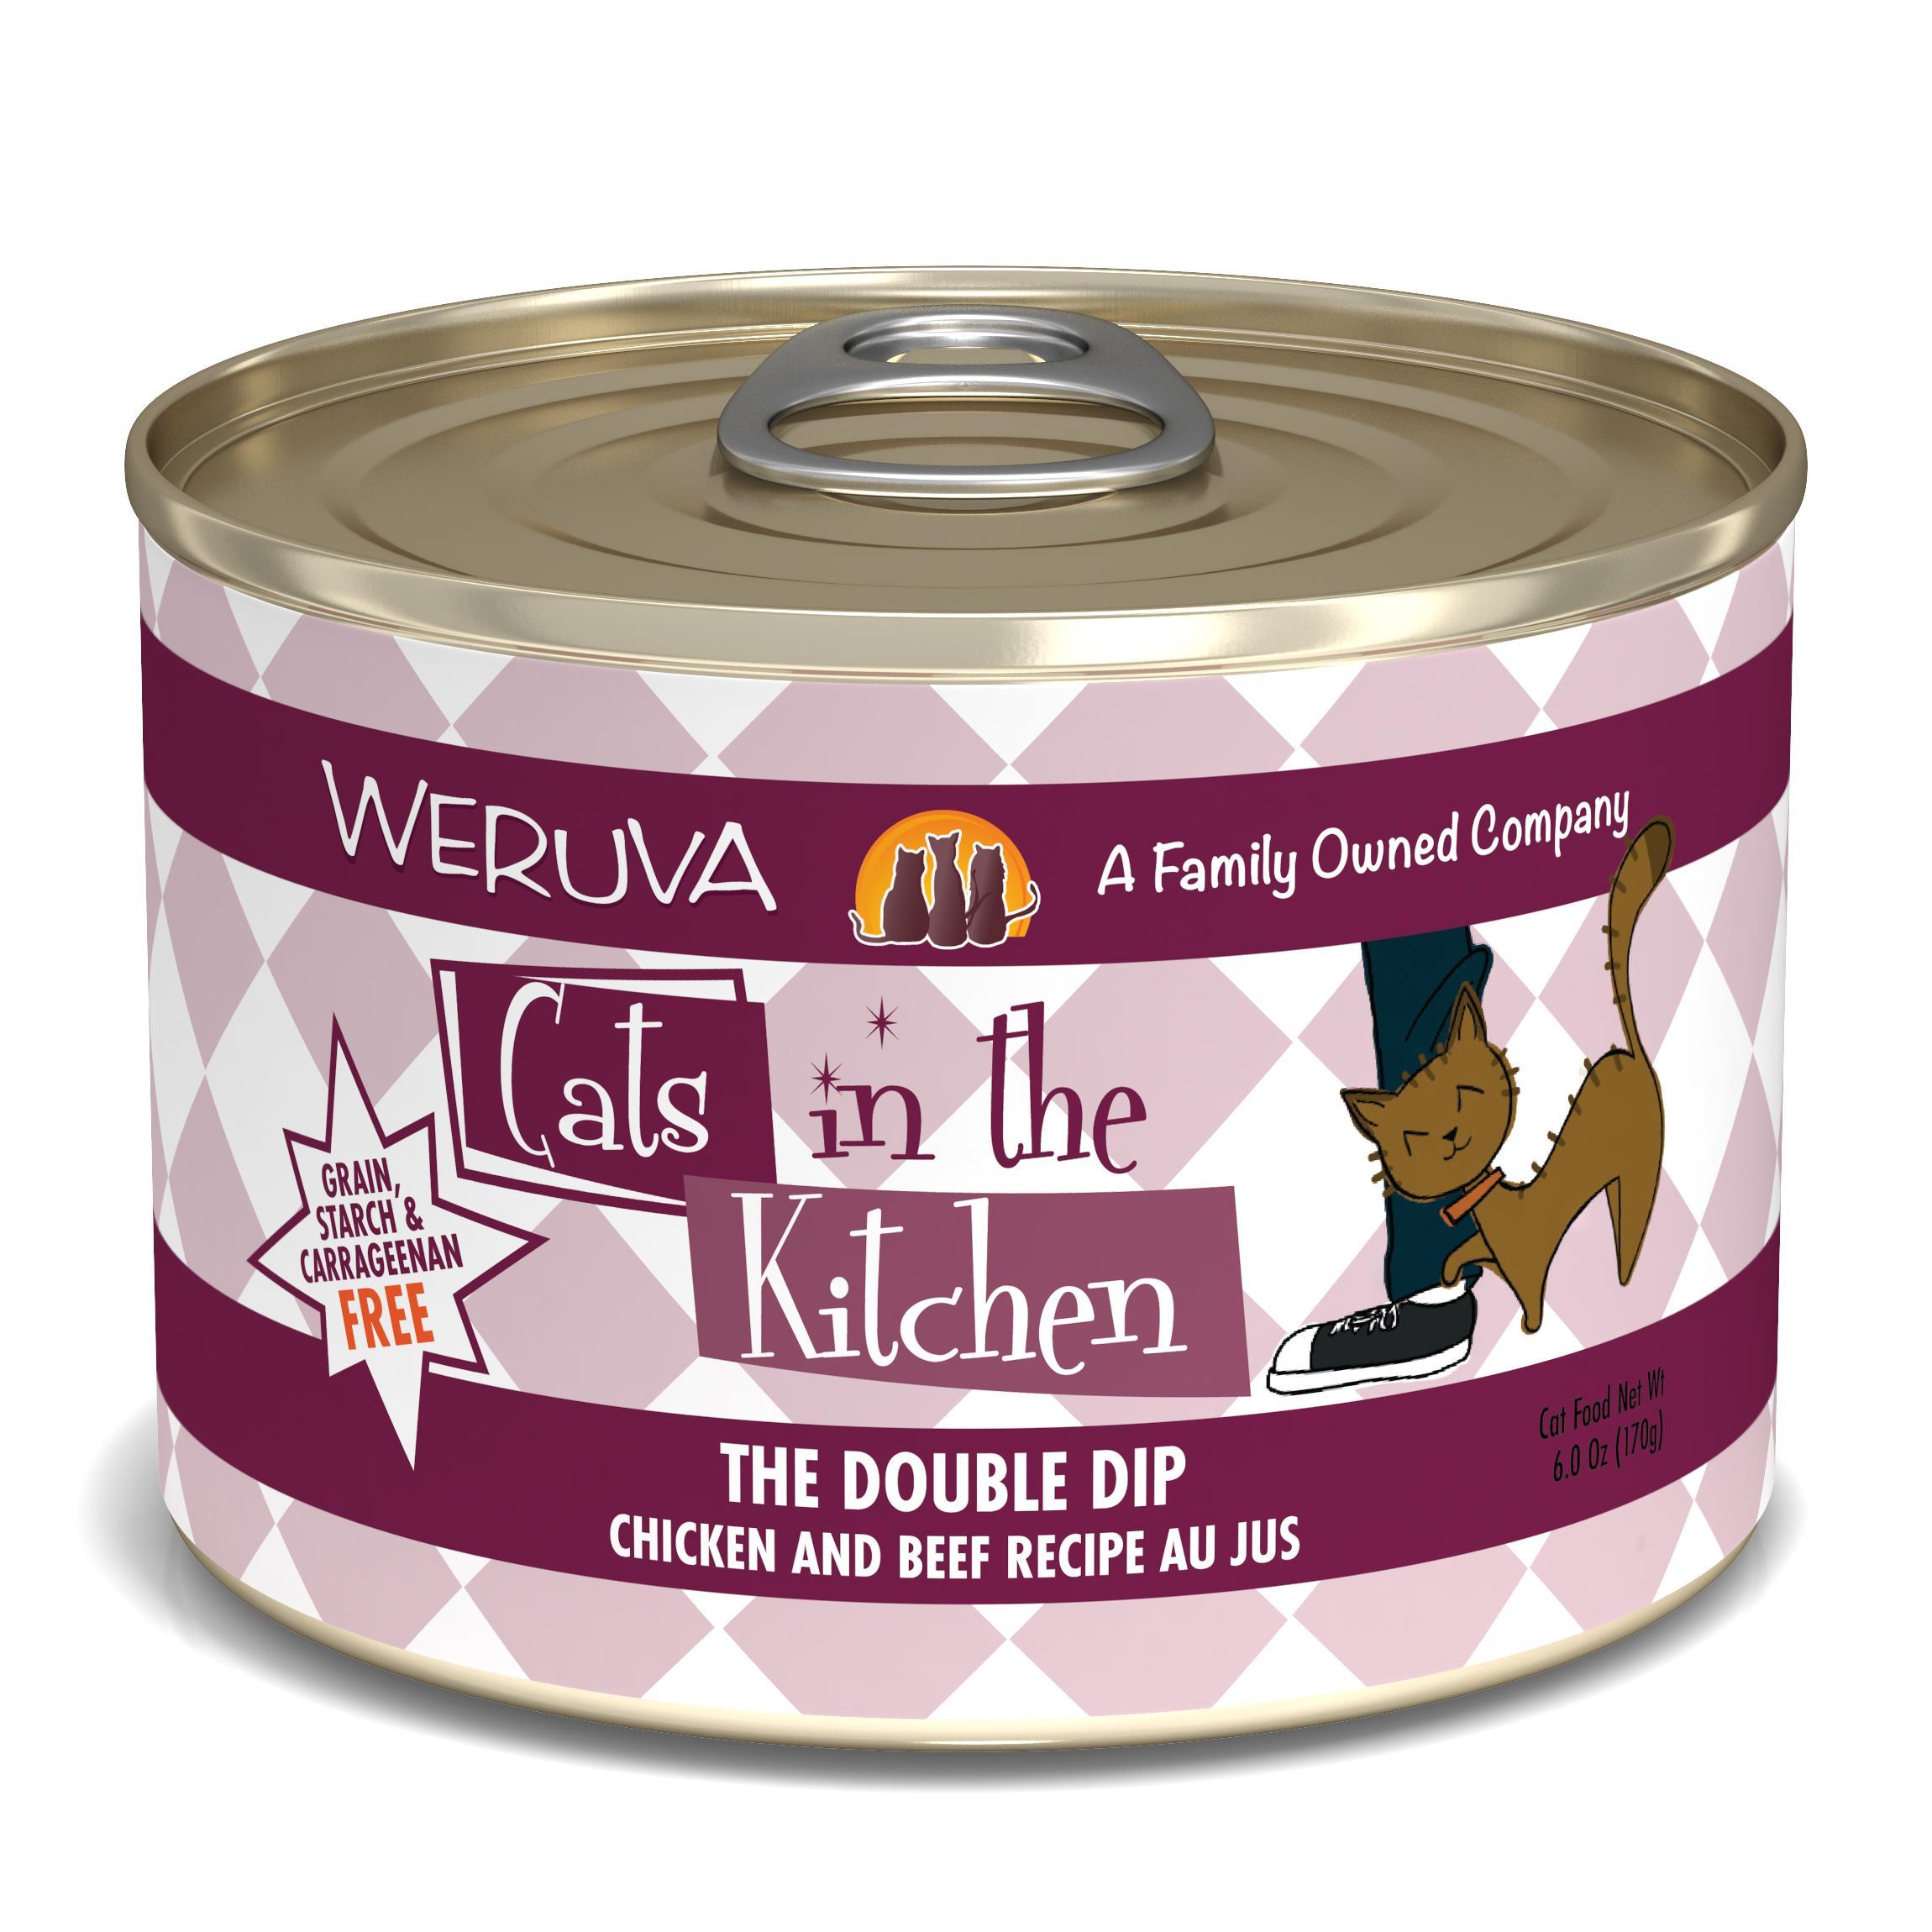 Weruva Cats in the Kitchen The Double Dip Chicken & Beef Au Jus Grain-Free Wet Cat Food, 6-oz